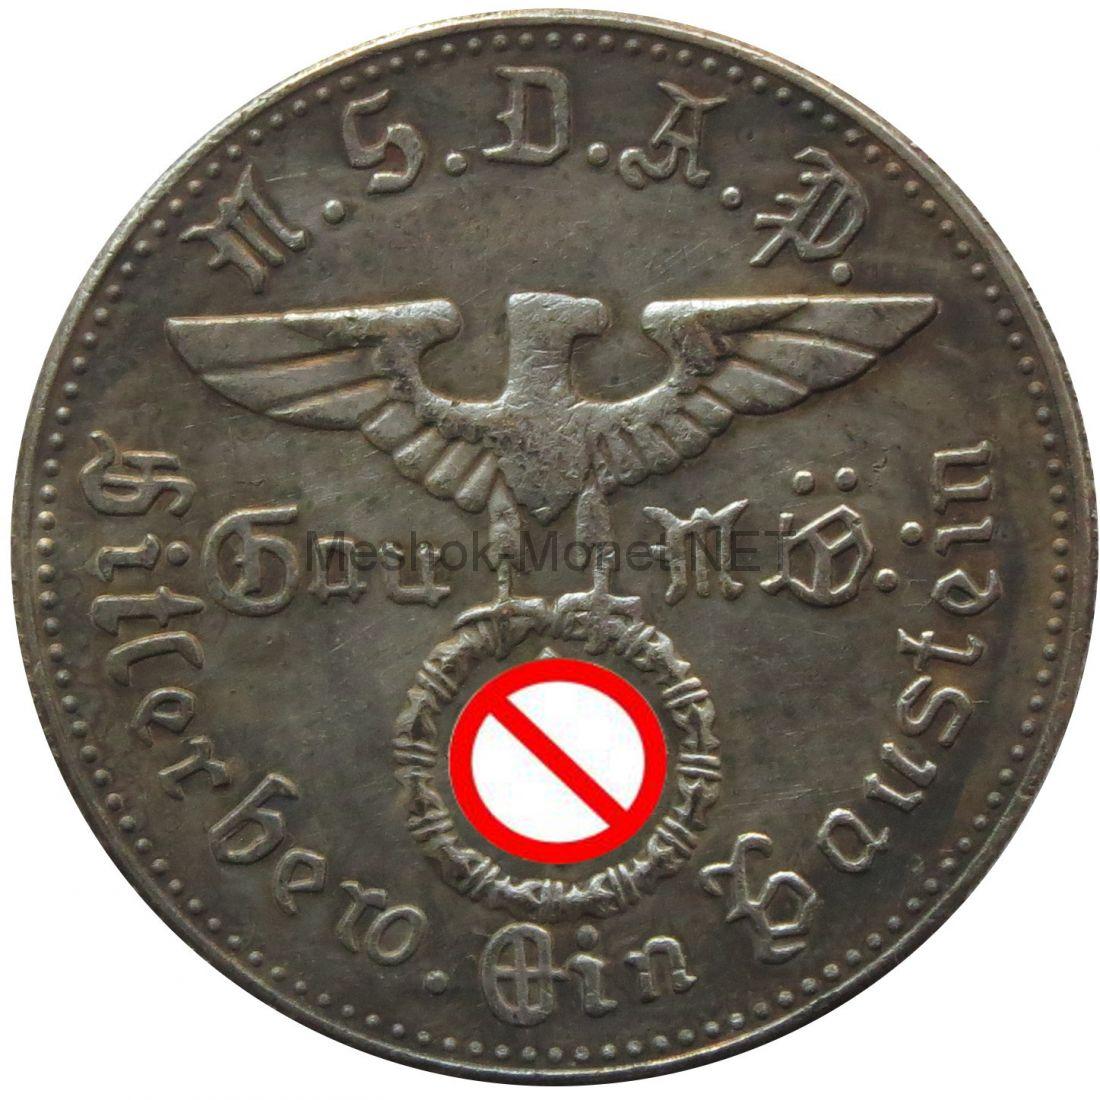 Копия Памятная медаль NSDAP